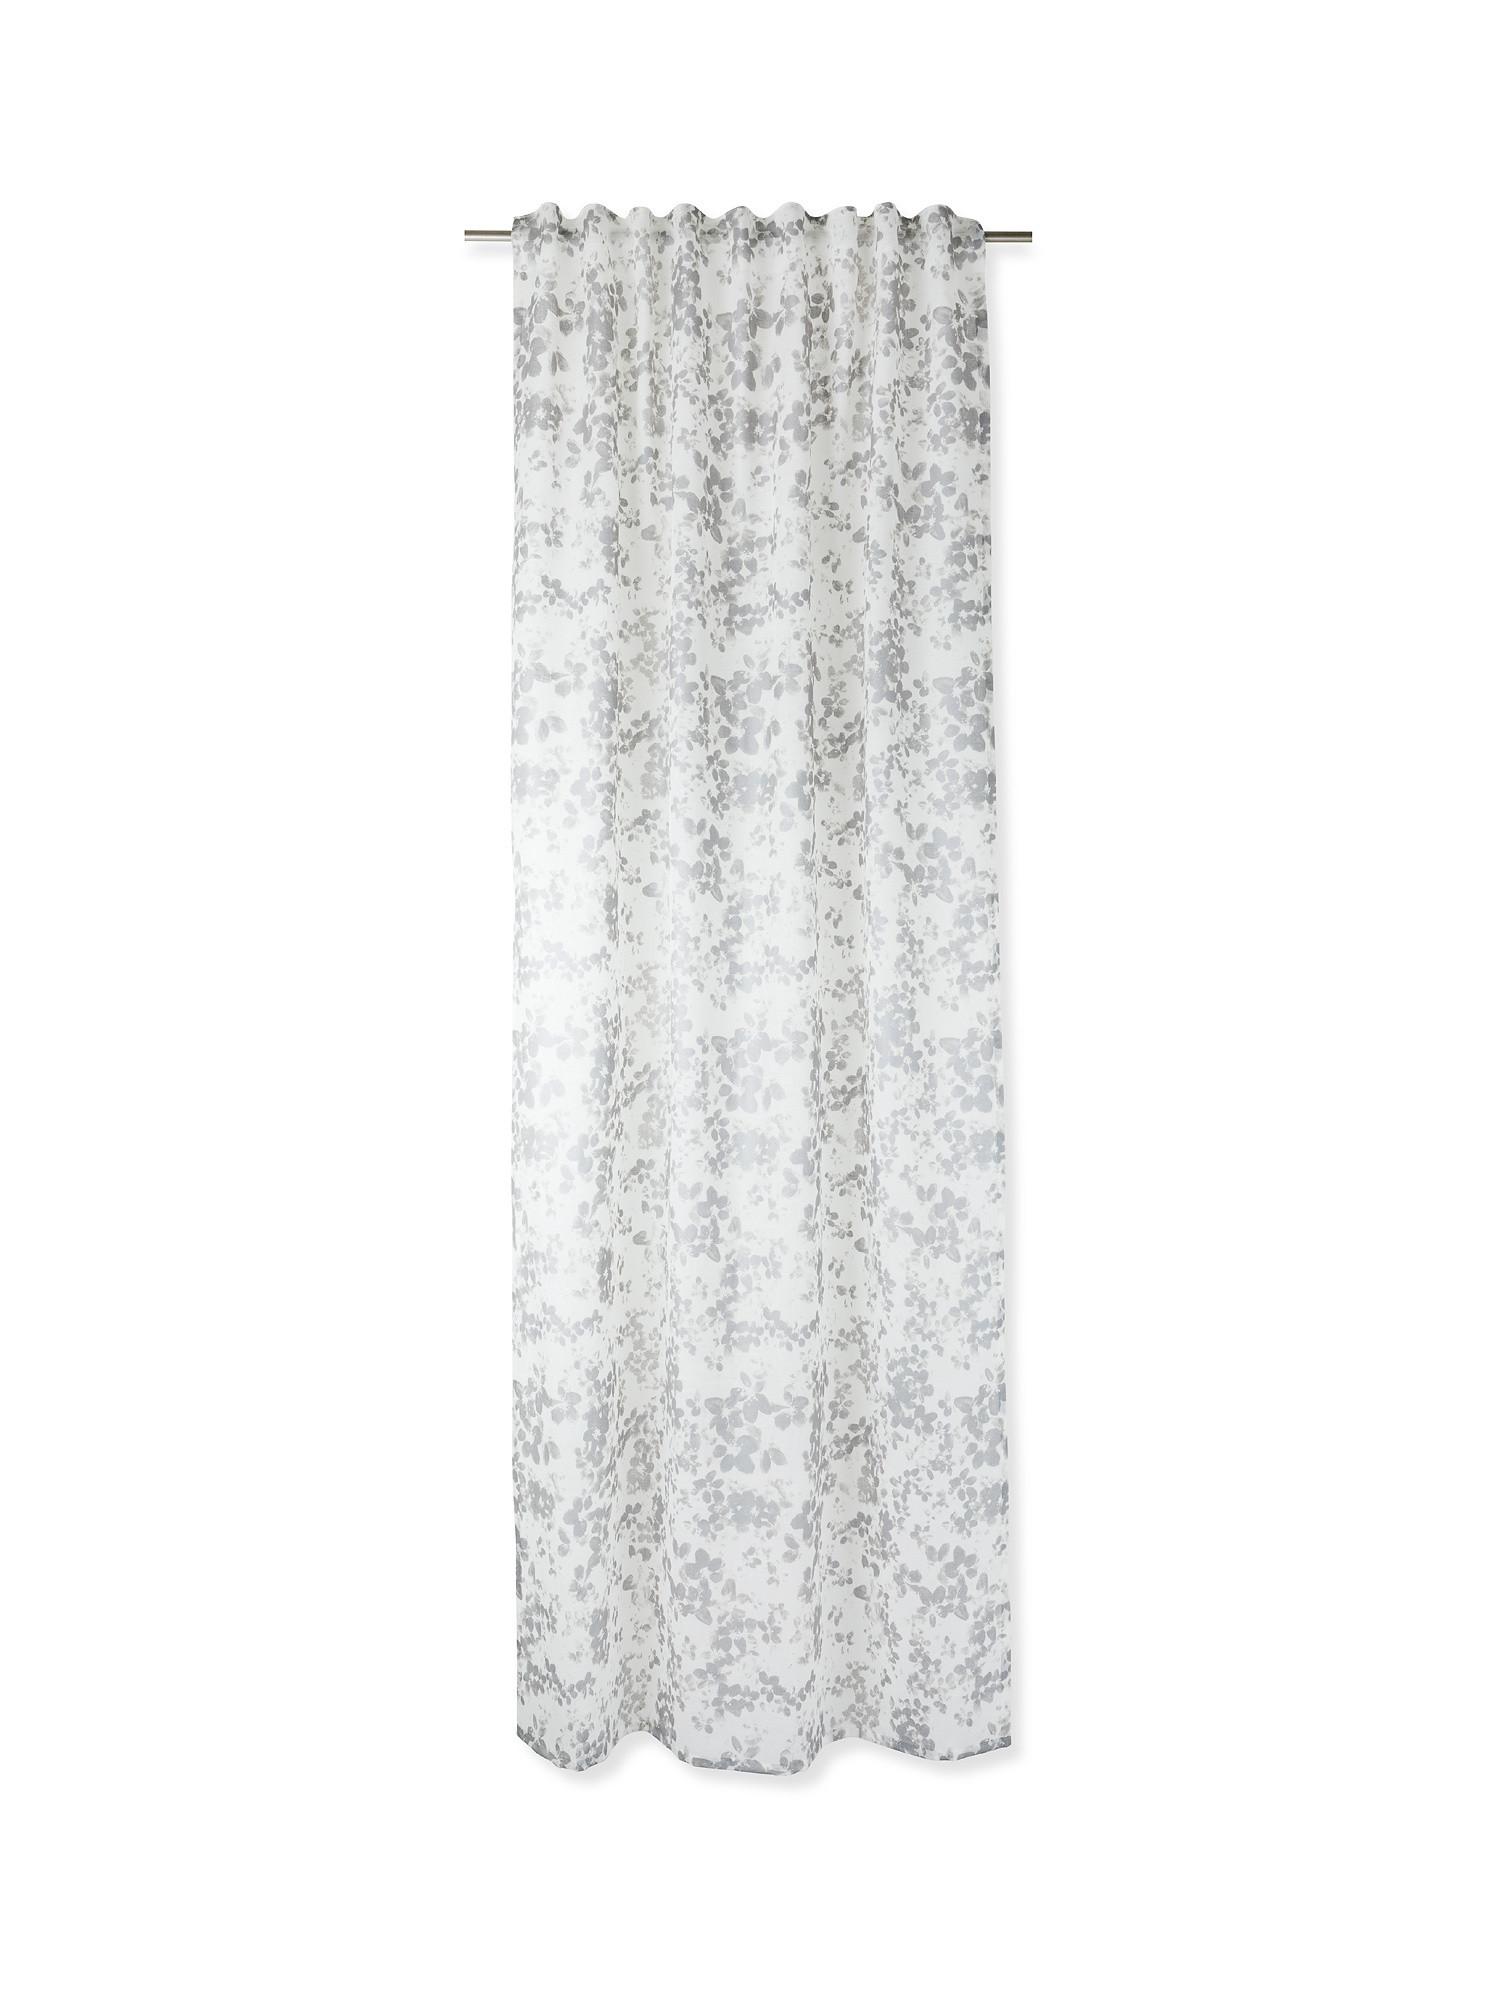 Tenda stampa floreale con passanti nascosti, Grigio, large image number 1